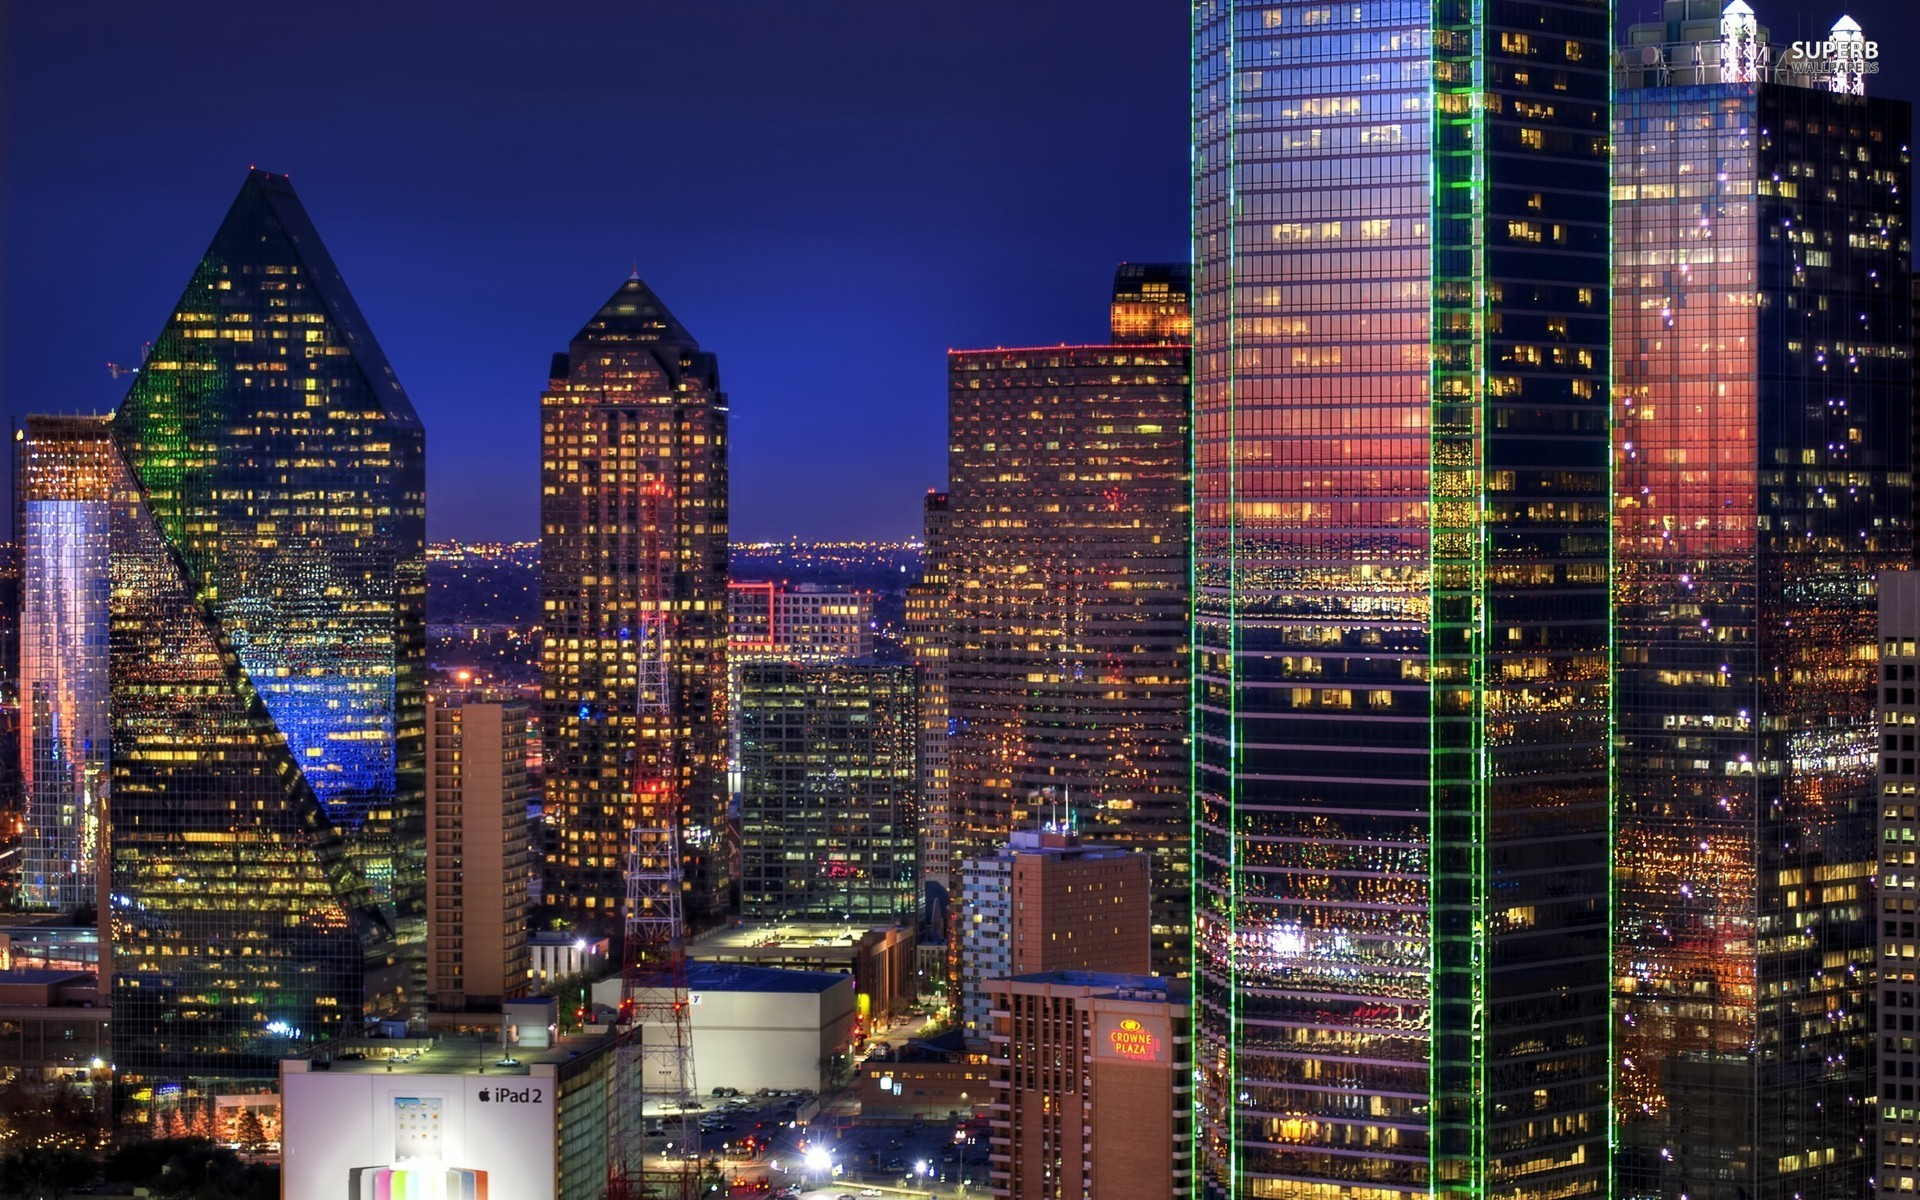 Atlanta Iphone X Wallpaper Skyline Wallpaper 183 ① Download Free Amazing Hd Backgrounds